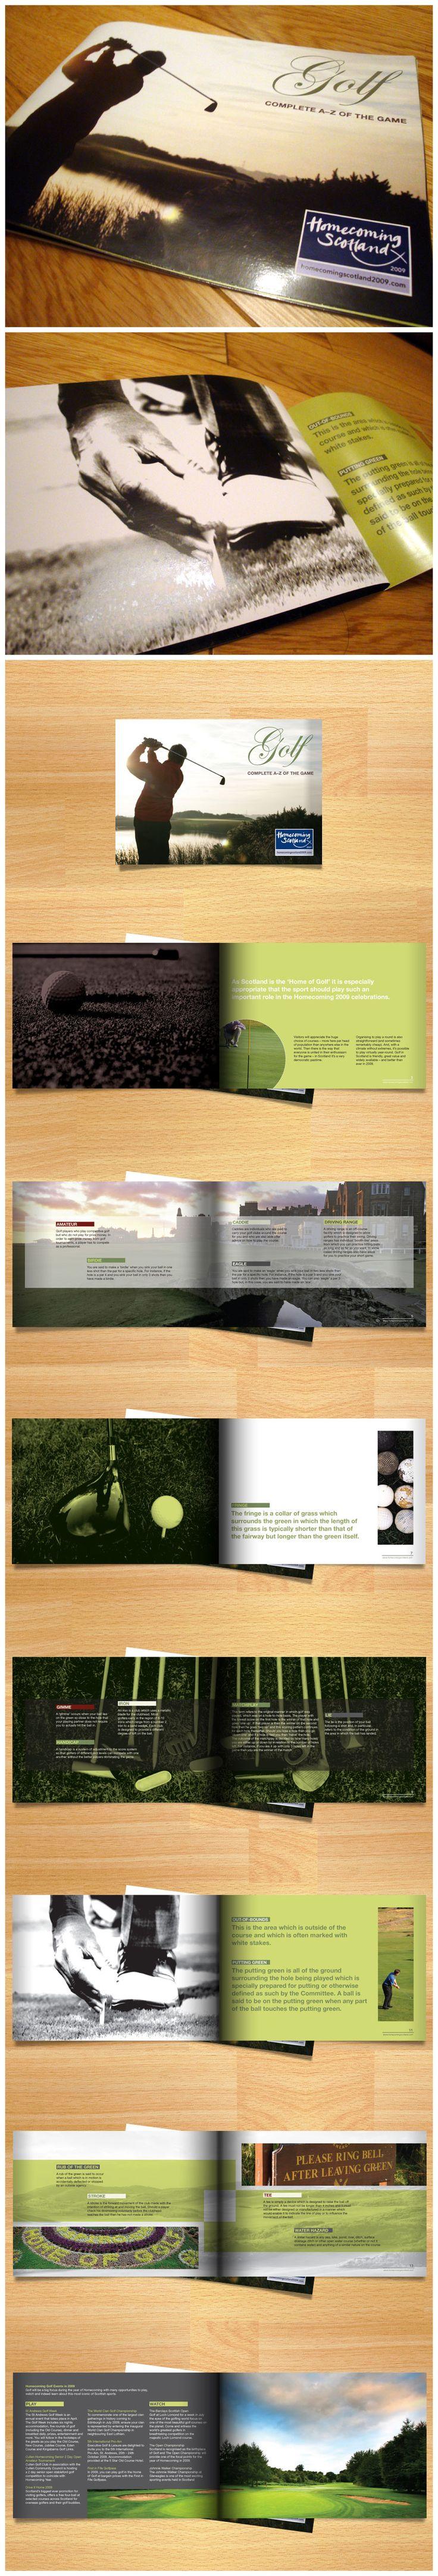 Fuzica Brochures Designerbrochures Design Graphics Print Marketing Business Brochuregraphics Brochuredesigncompany Brochurecompany